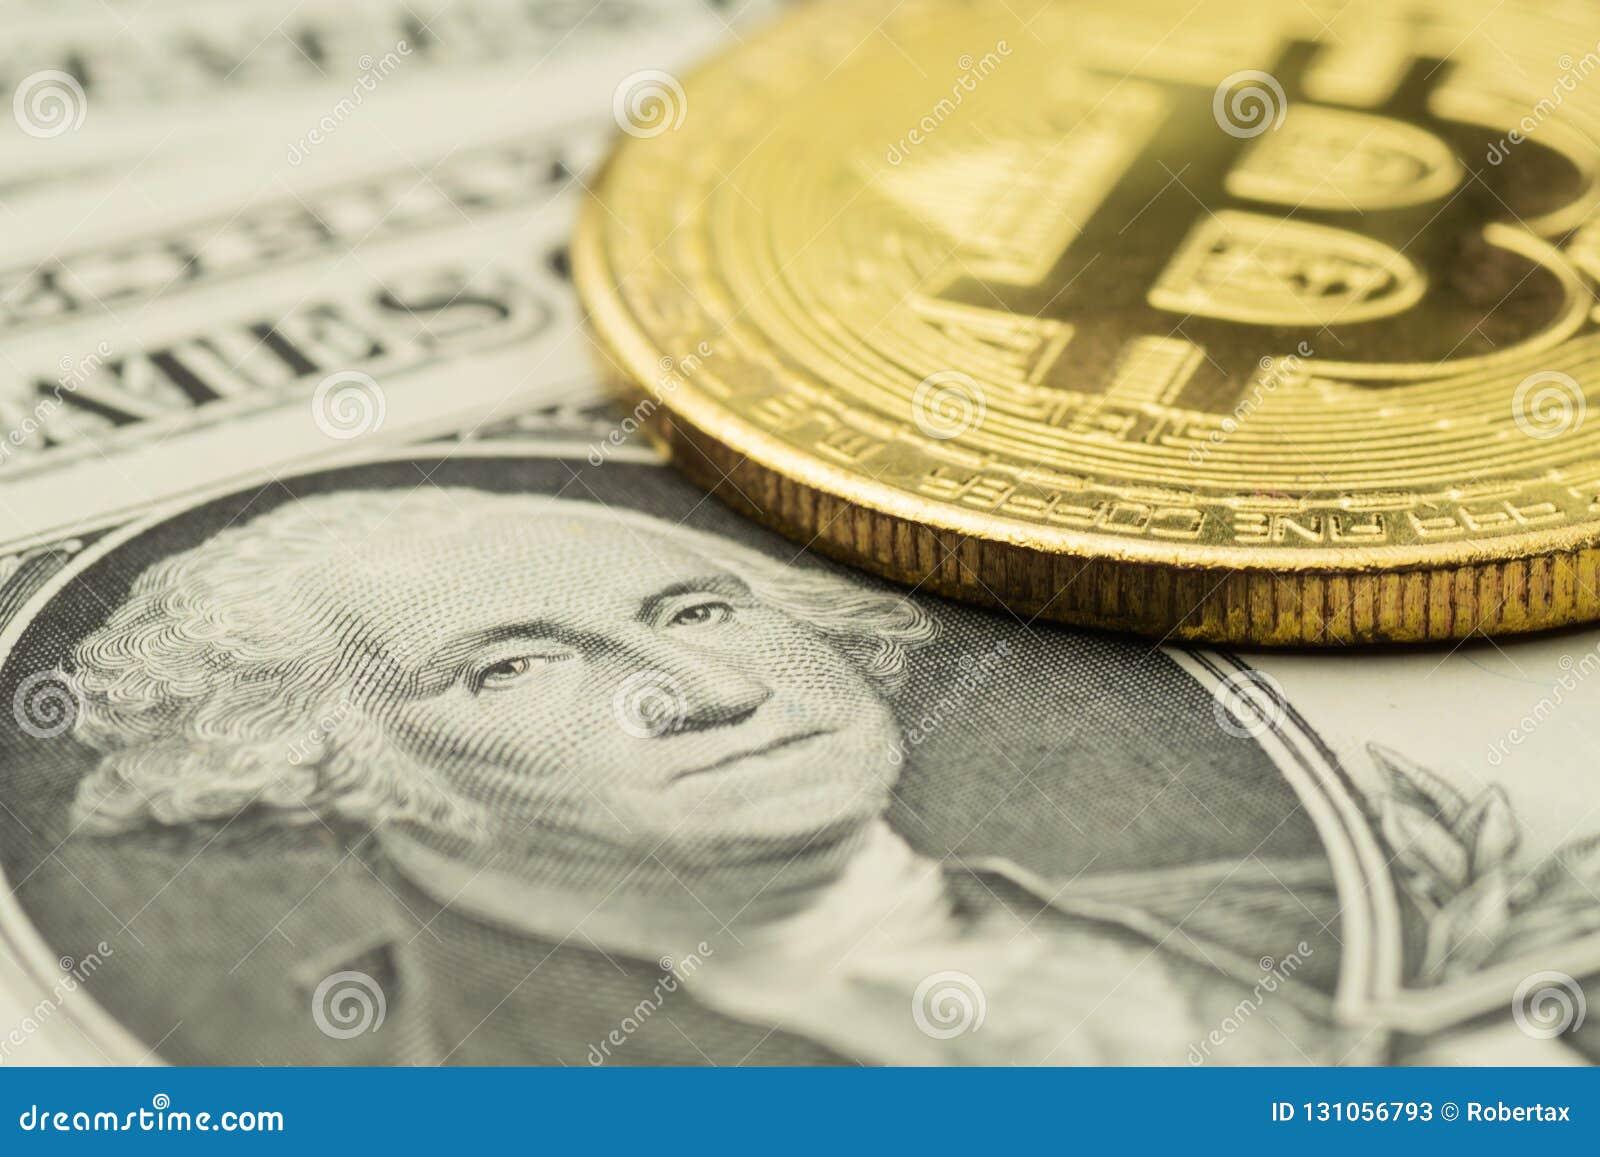 dakota coin cryptocurrency